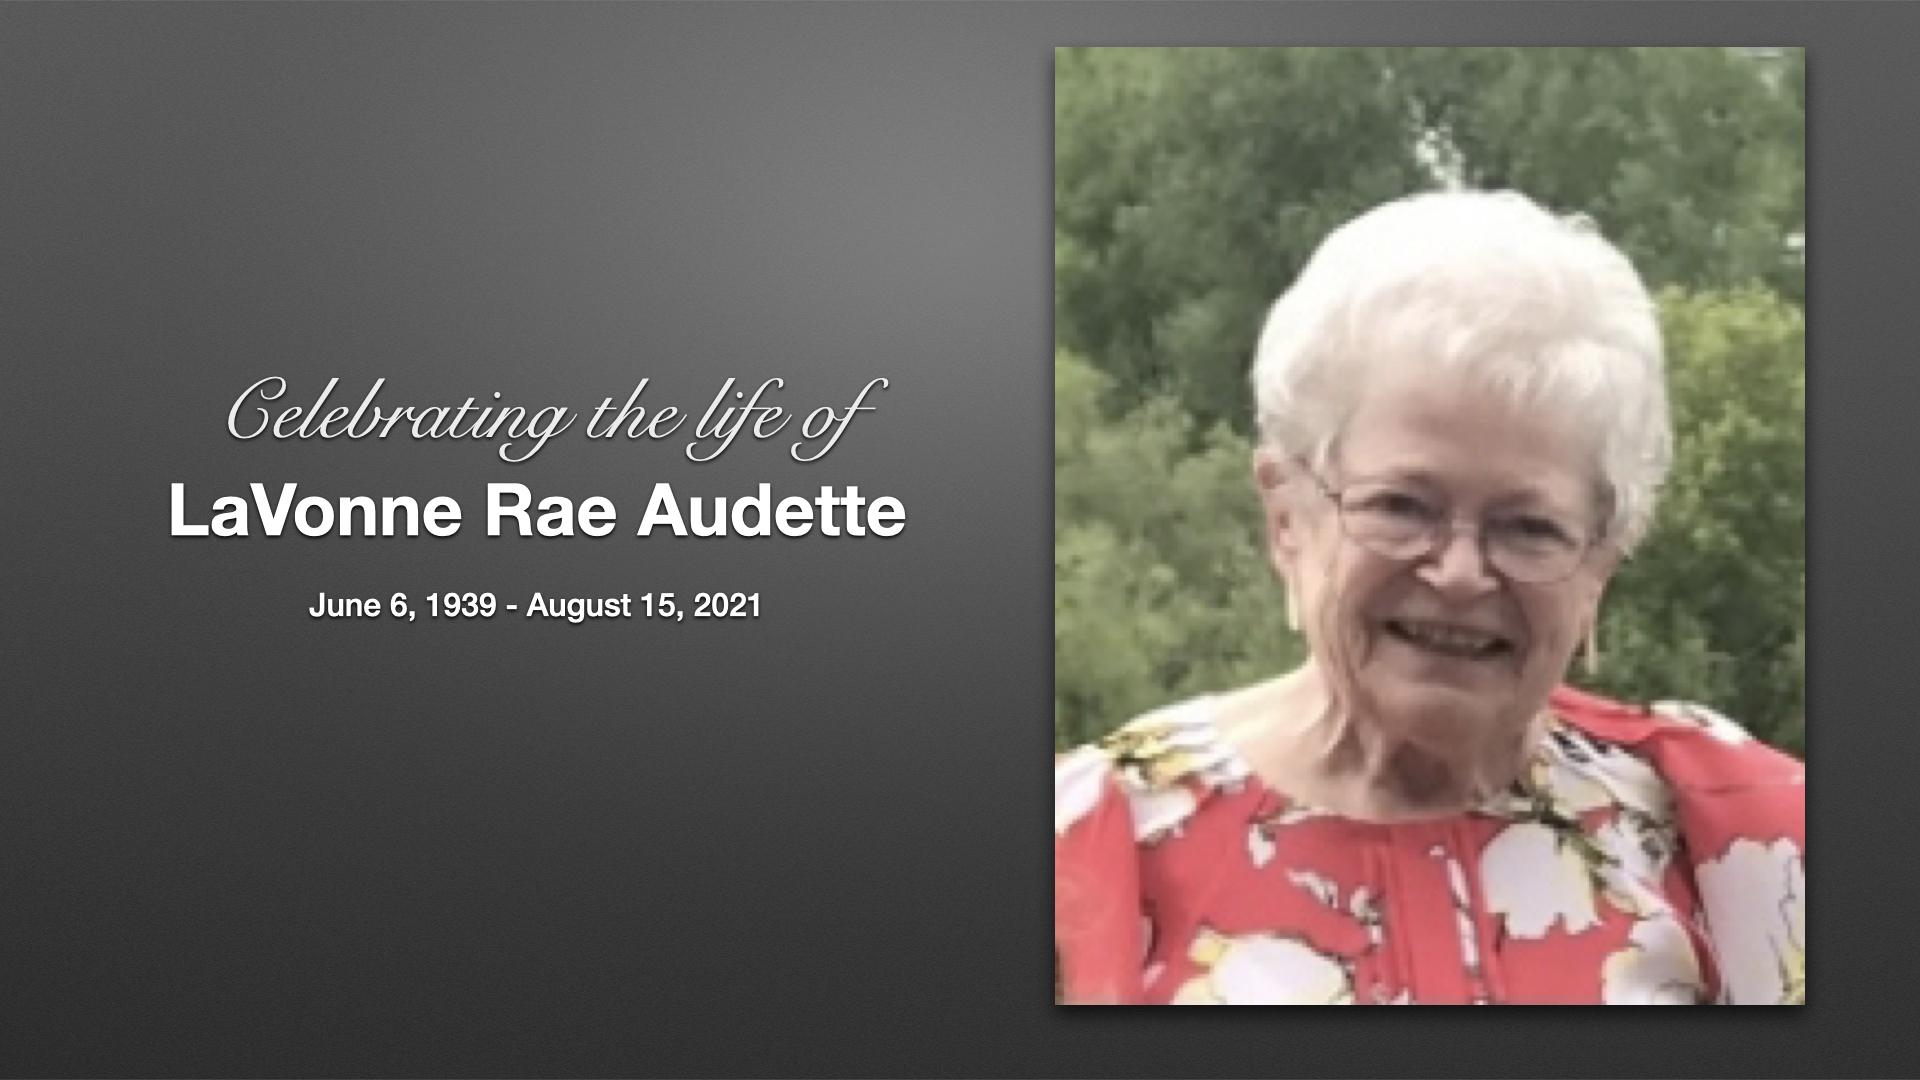 Celebrating the life of LaVonne Audette.